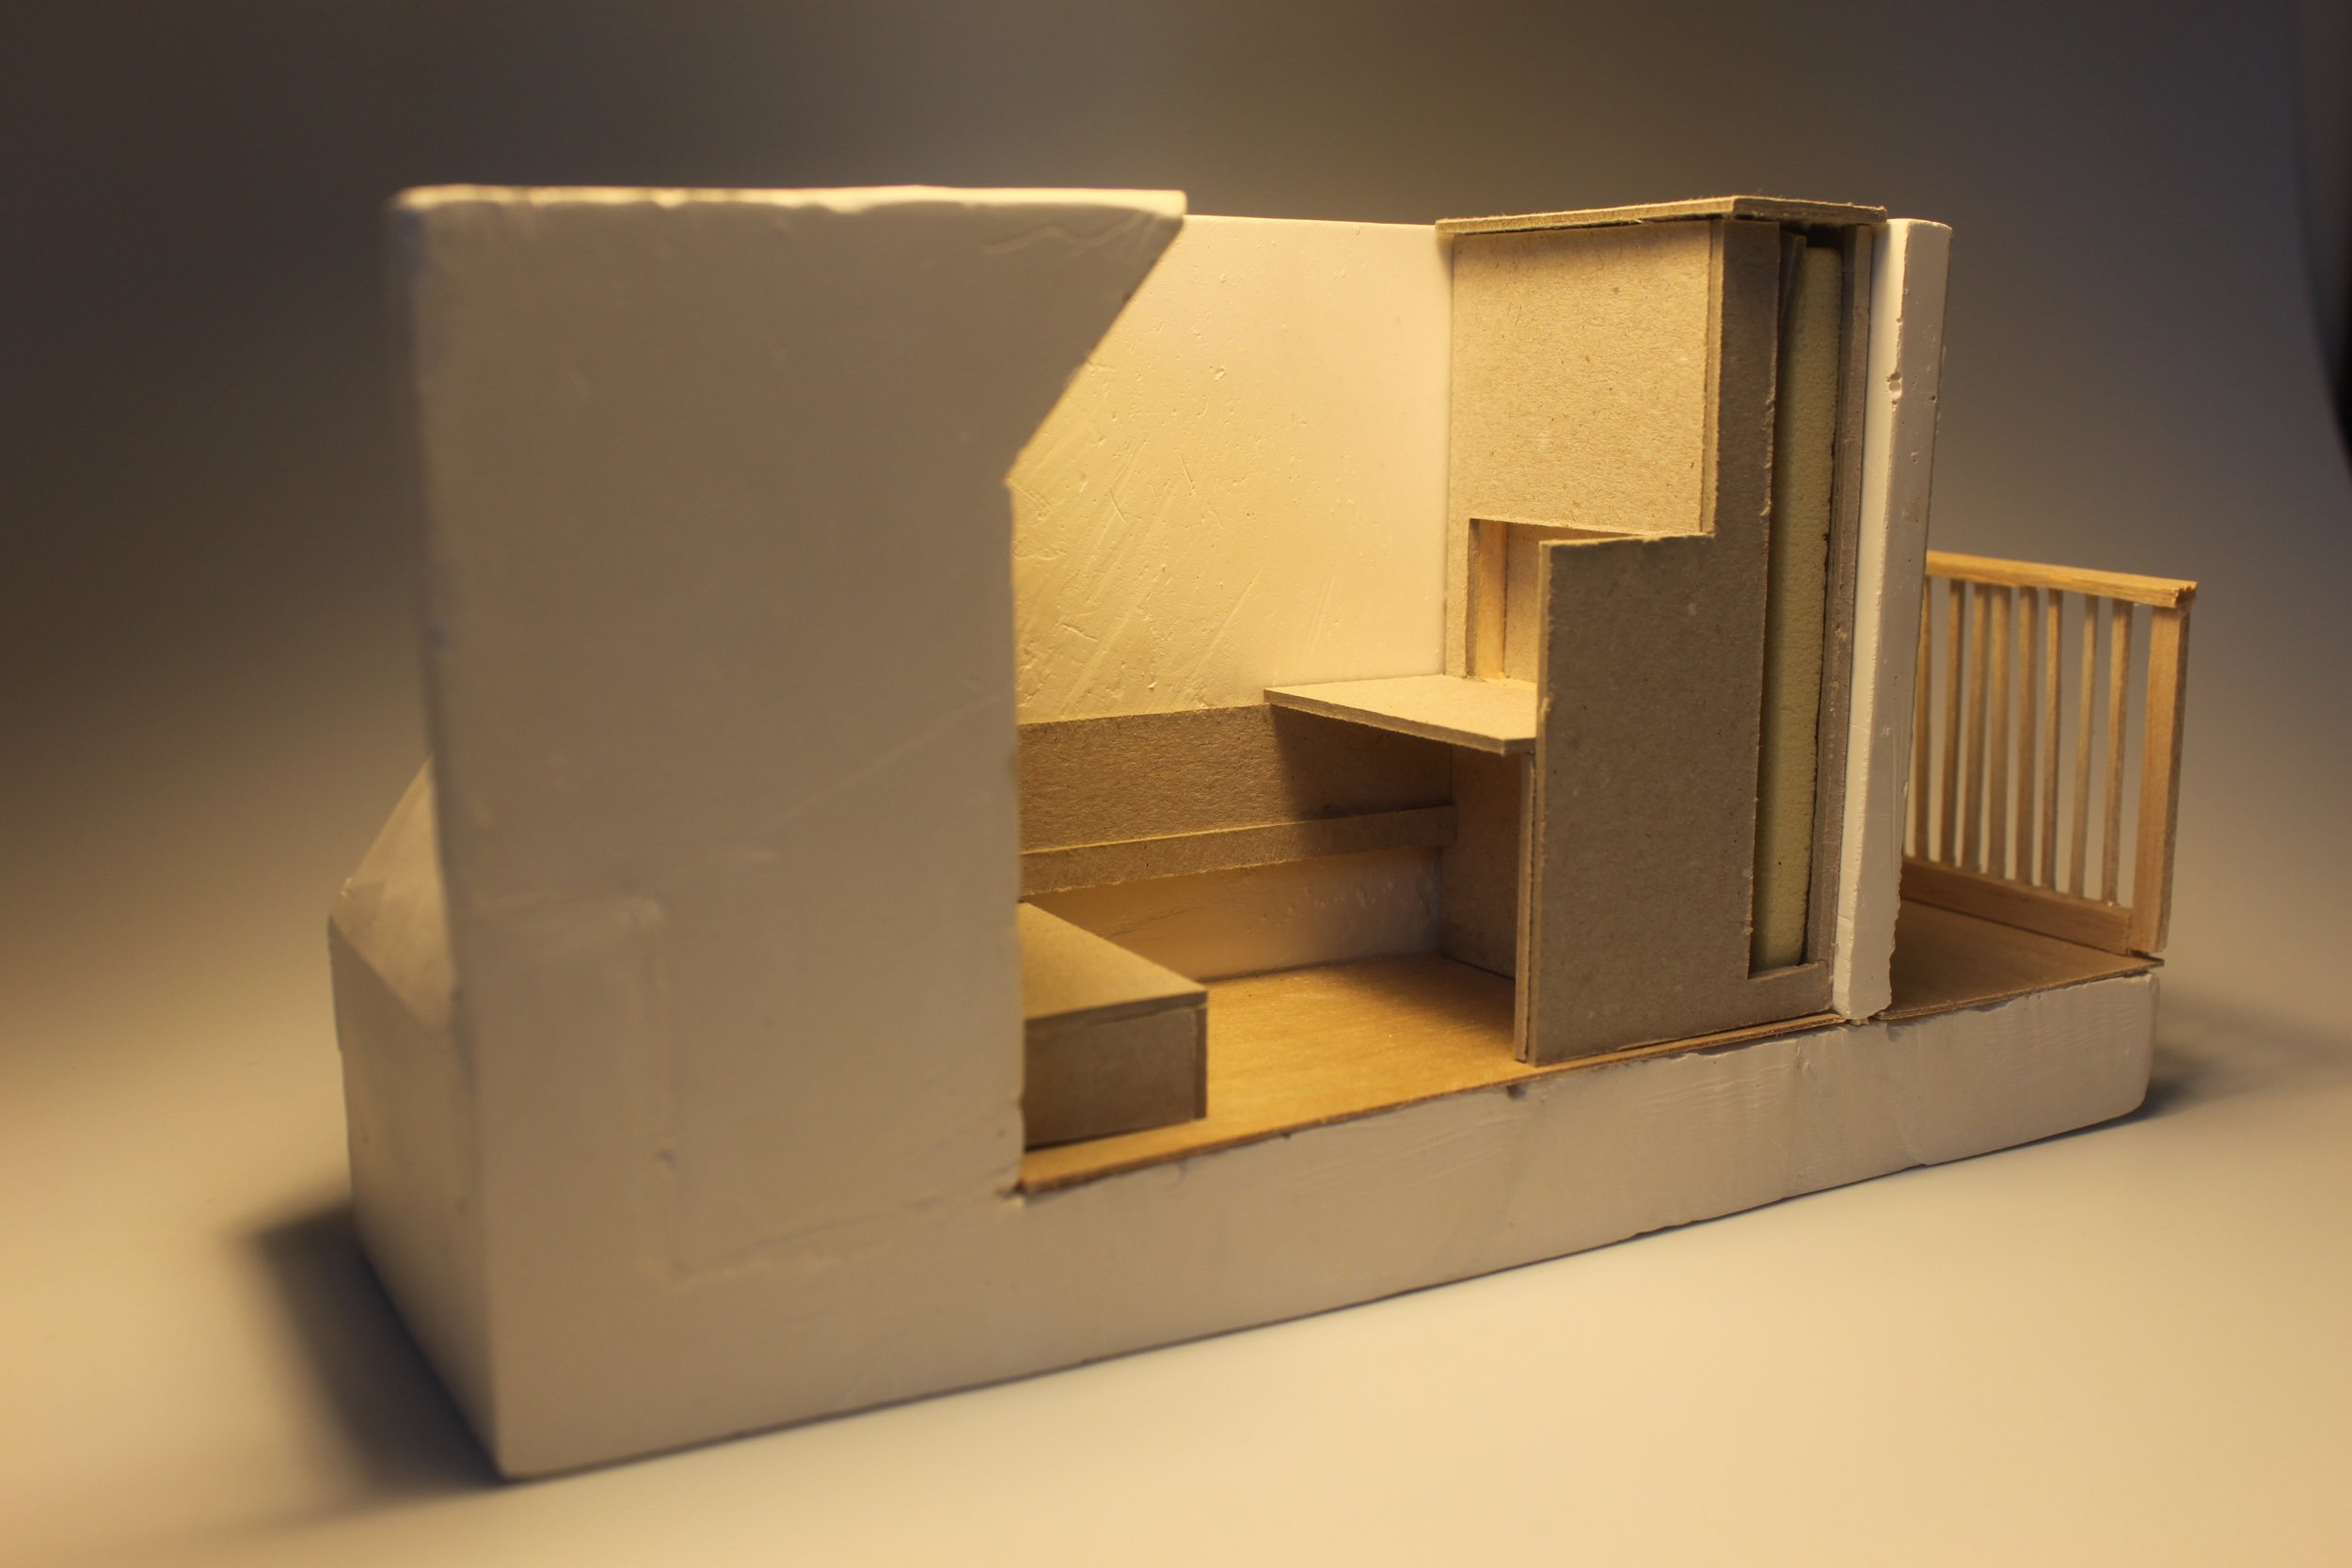 118 Bedroom Model Desk.jpg